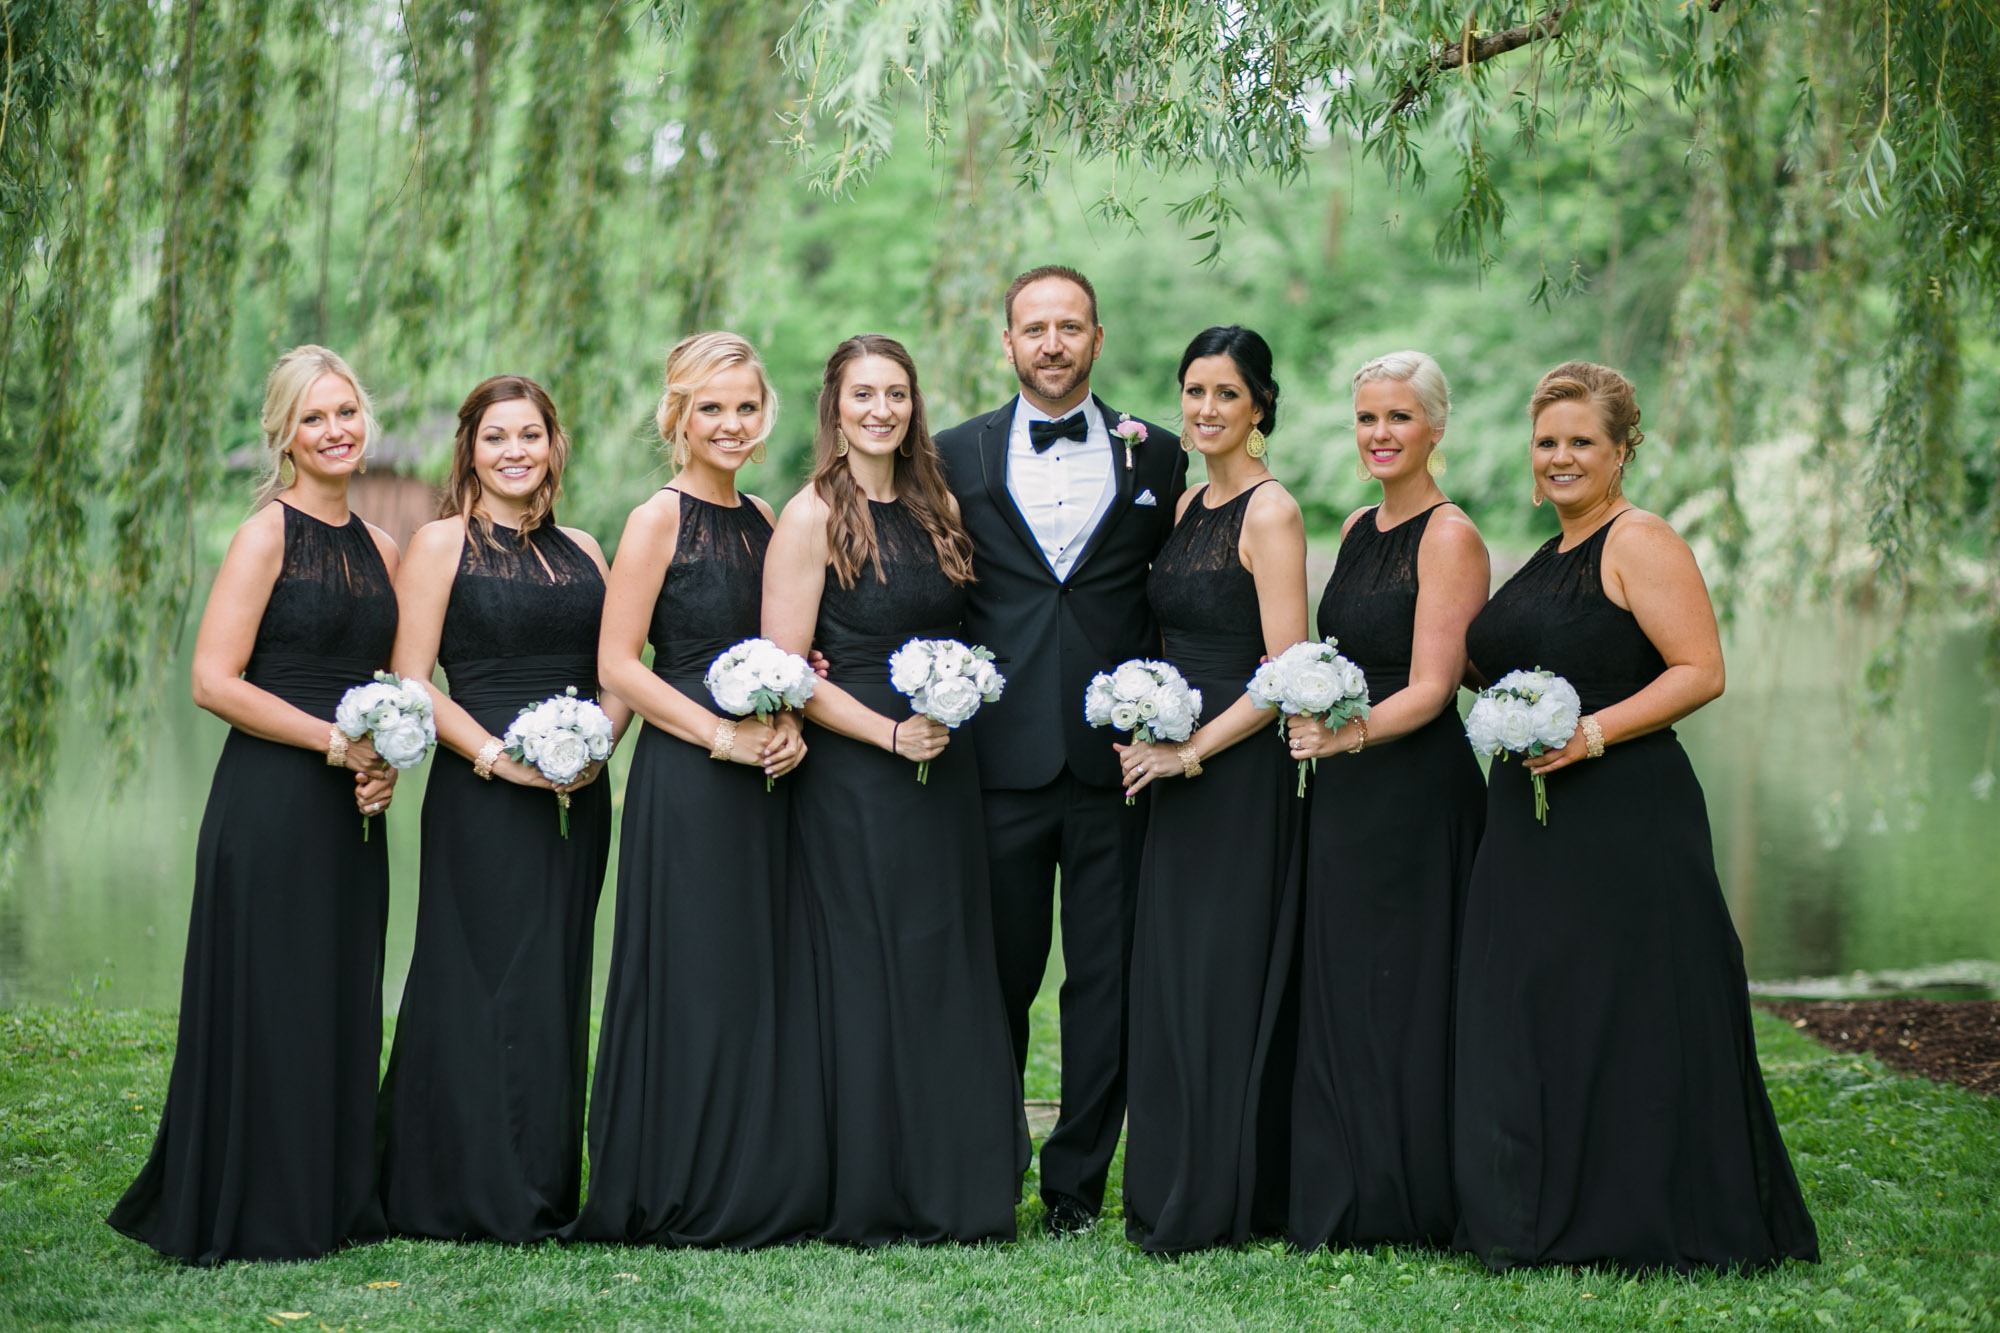 hensville-wedding-downtown-toledo-ohio (52 of 103).jpg